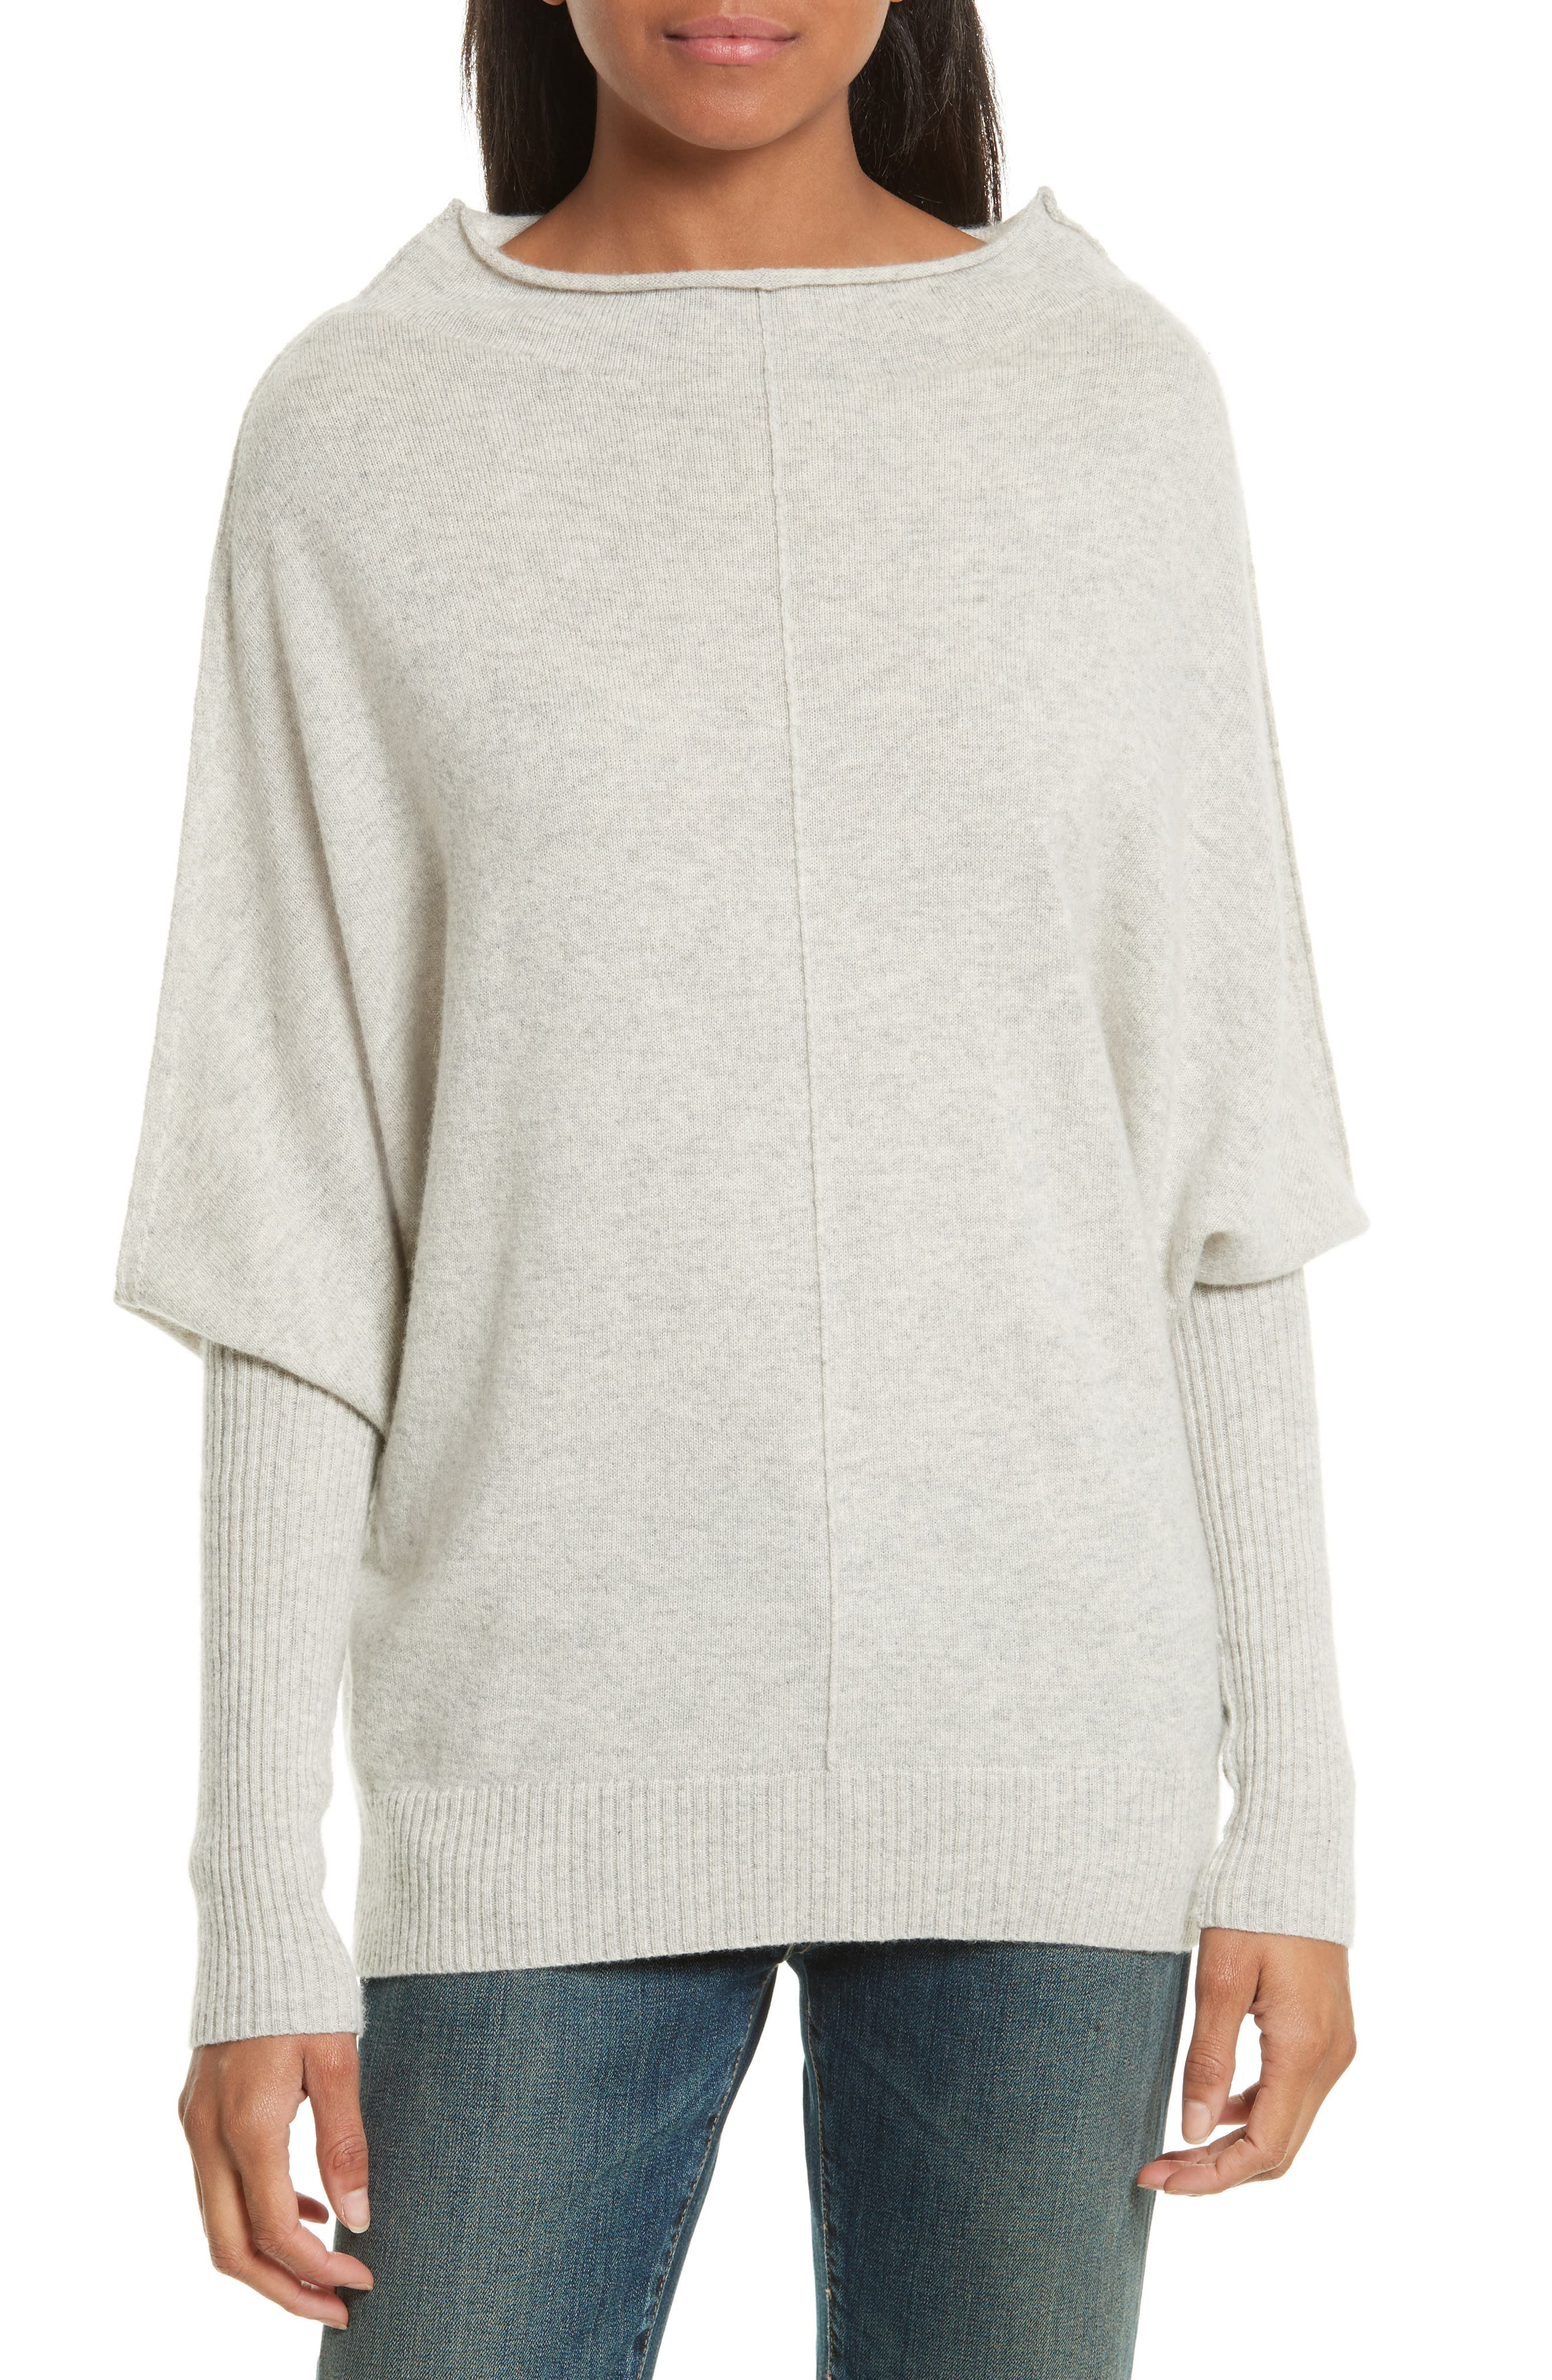 Main Image - Nili Lotan Rosalie Cashmere Sweater